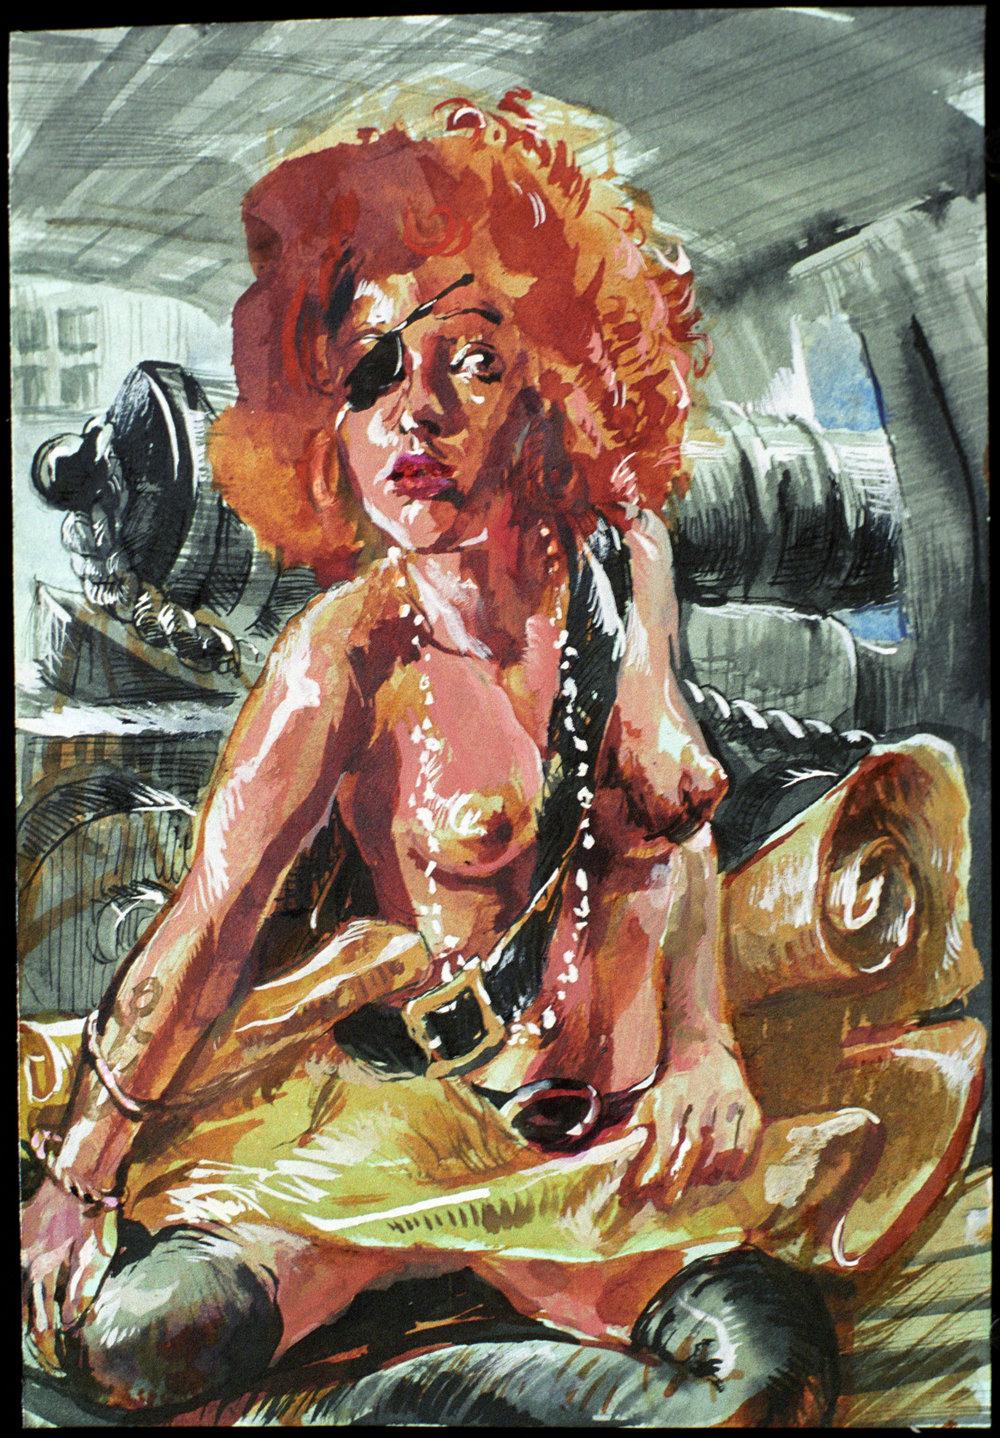 Stowaway   2015, 30 x 22 watercolor